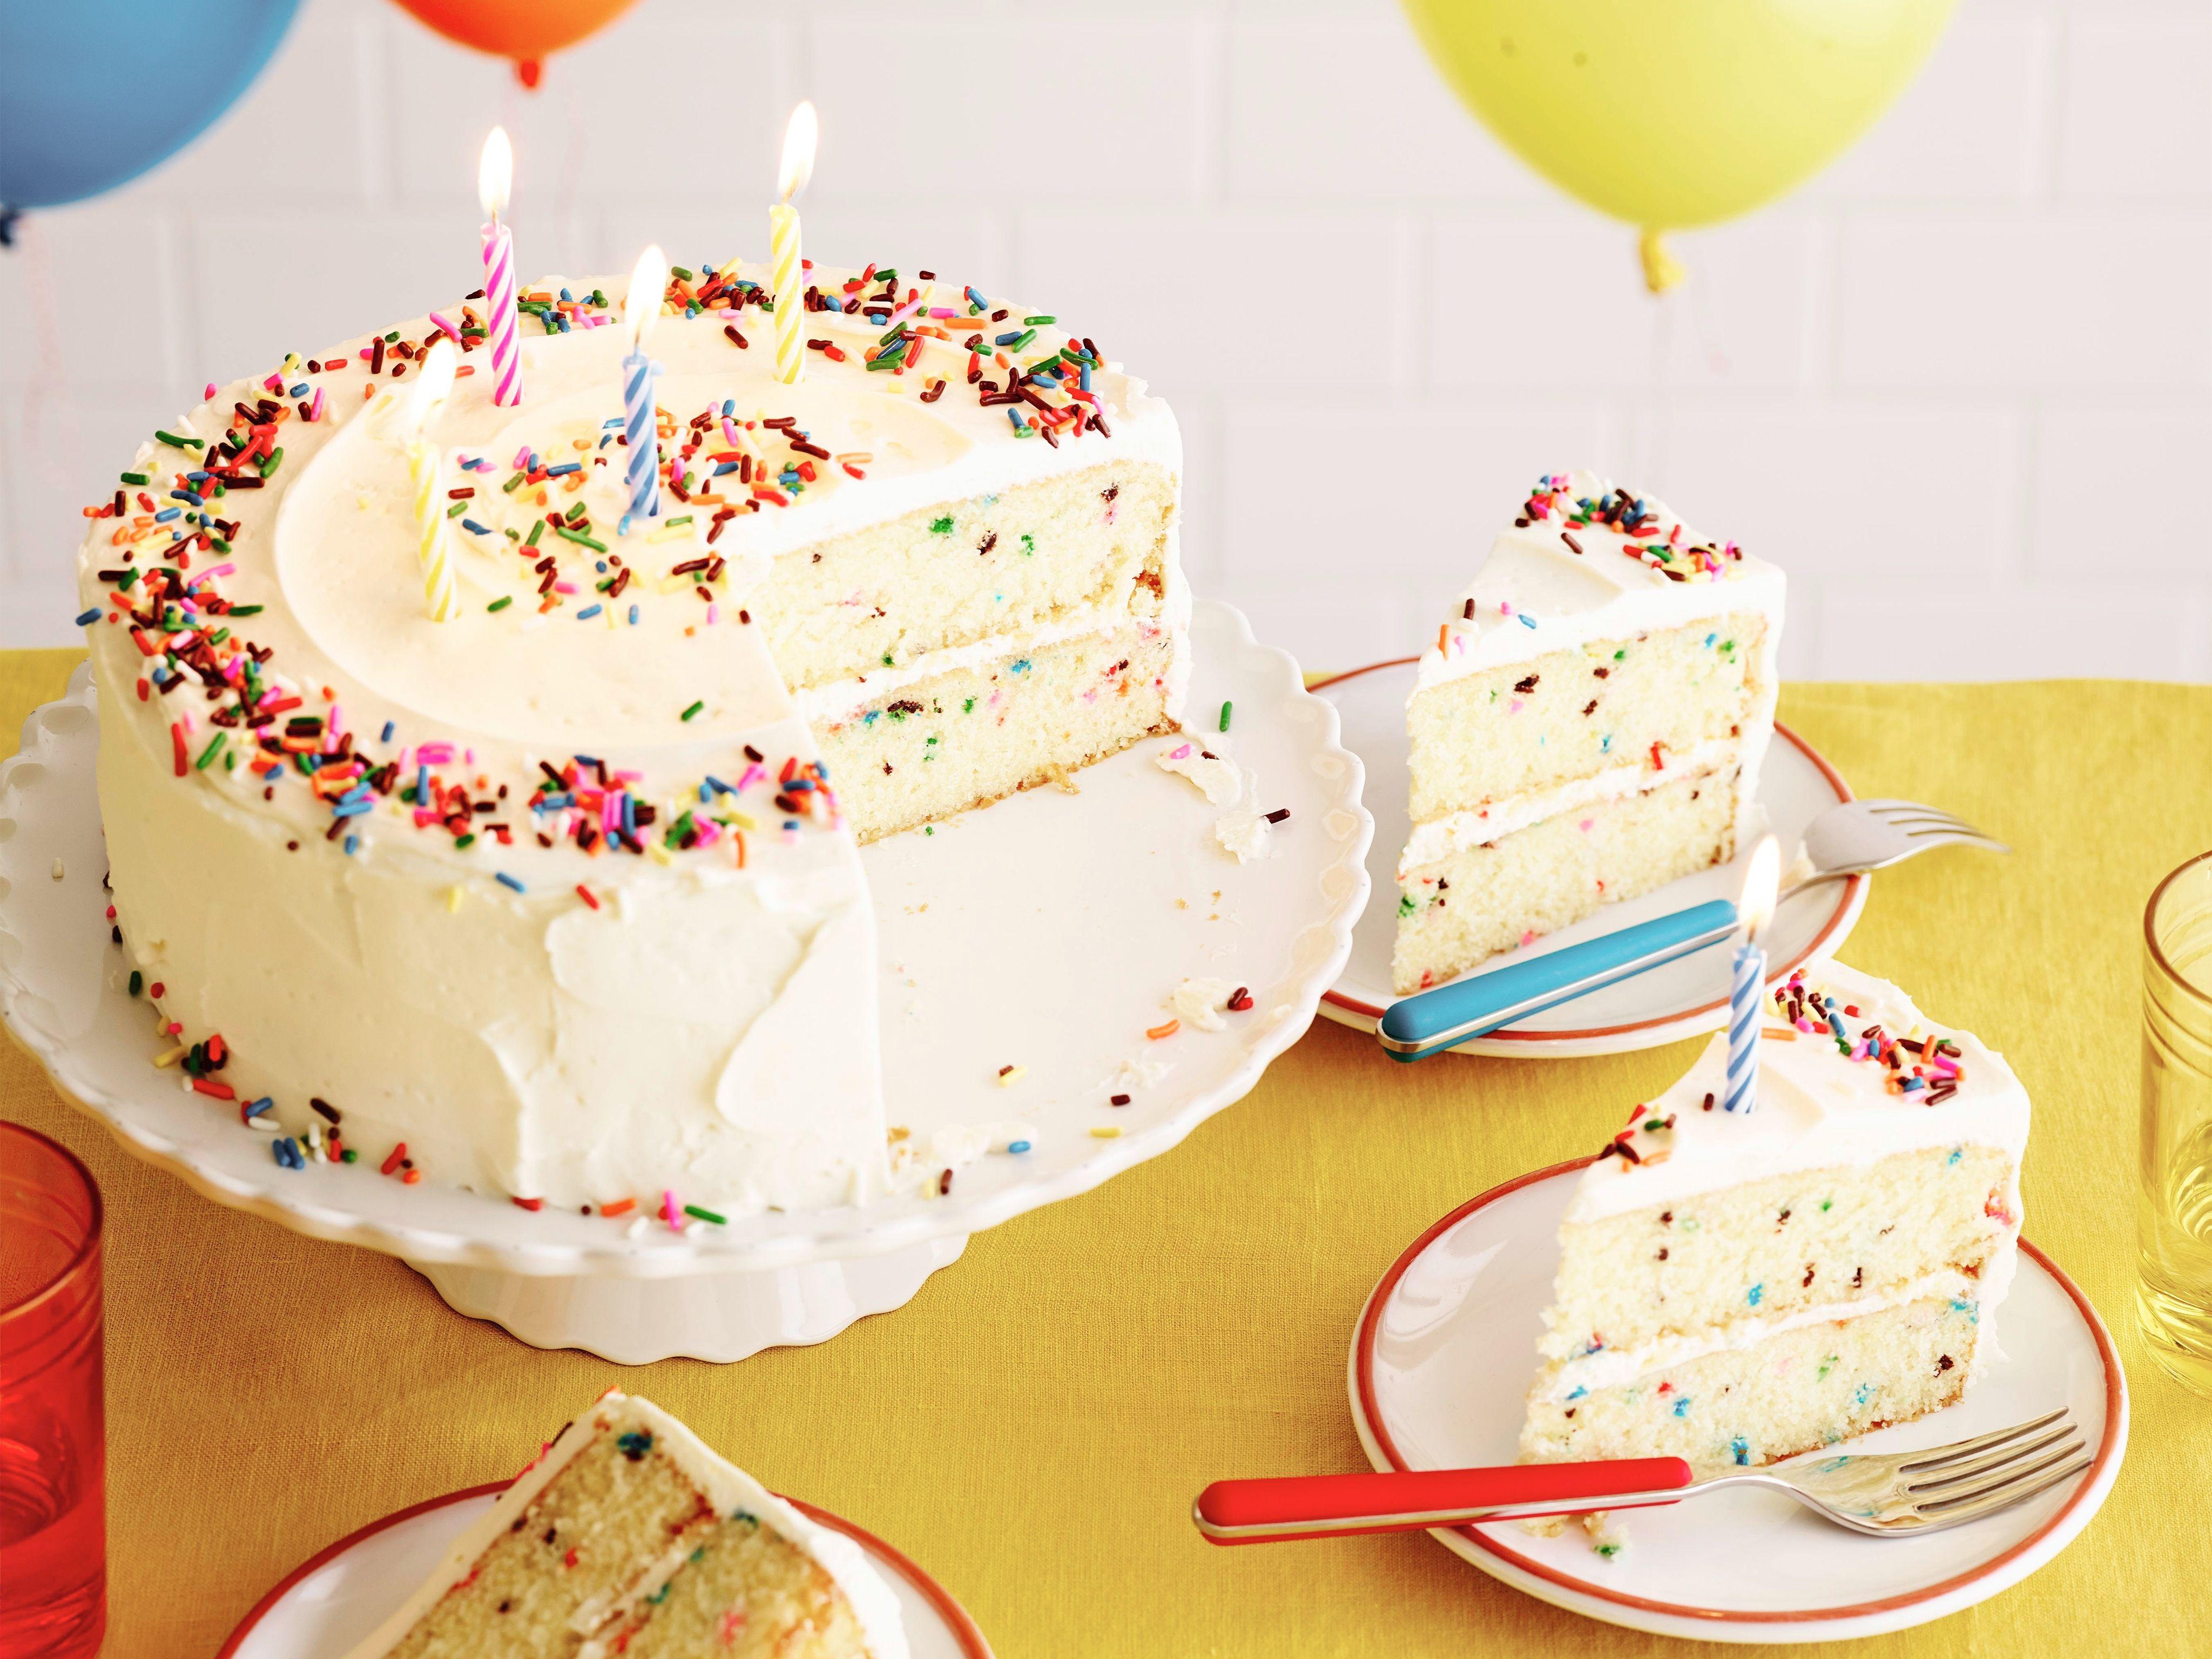 Happy Birthday HD Cake Wallpaper Images High Quality Birthday HD